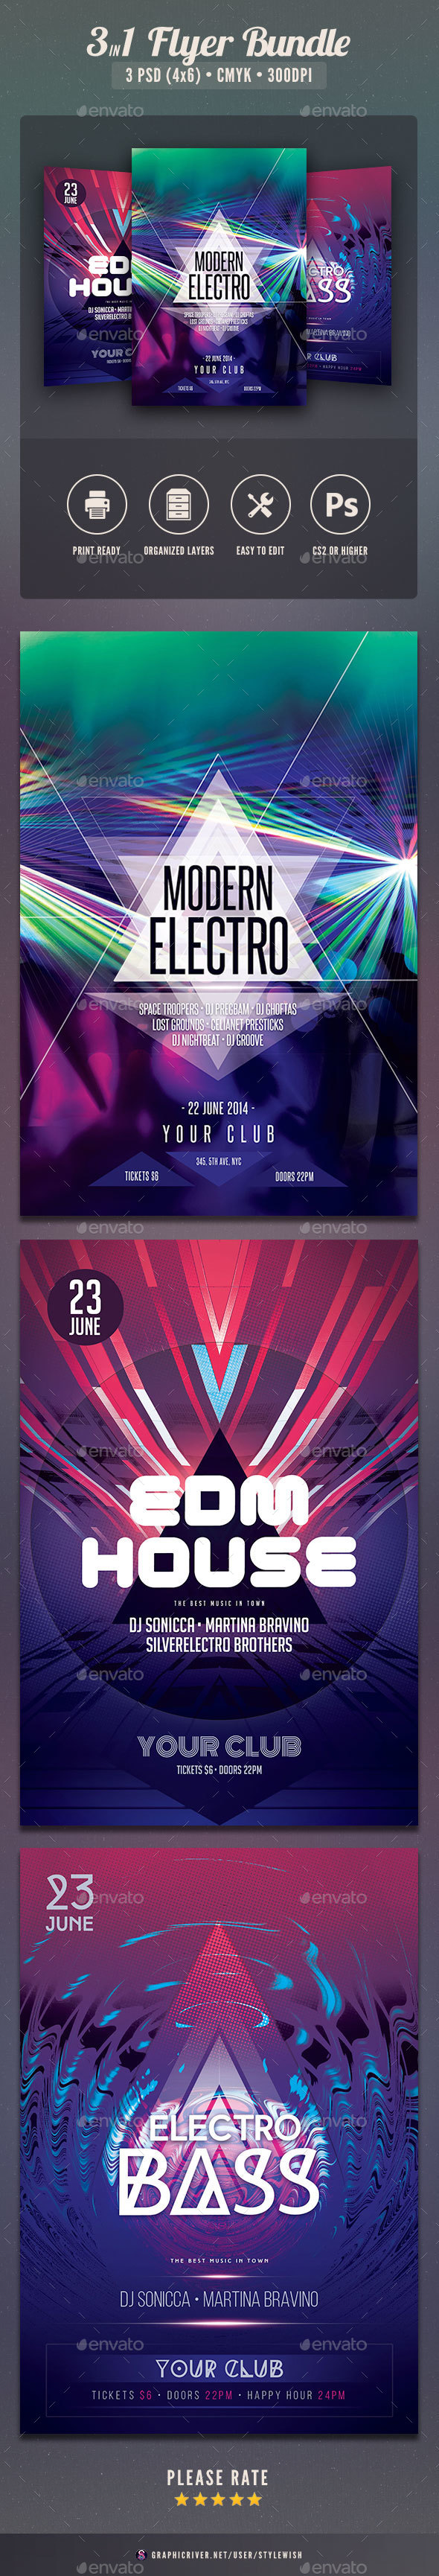 Electro Party Flyer Bundle Vol.5 - Clubs & Parties Events